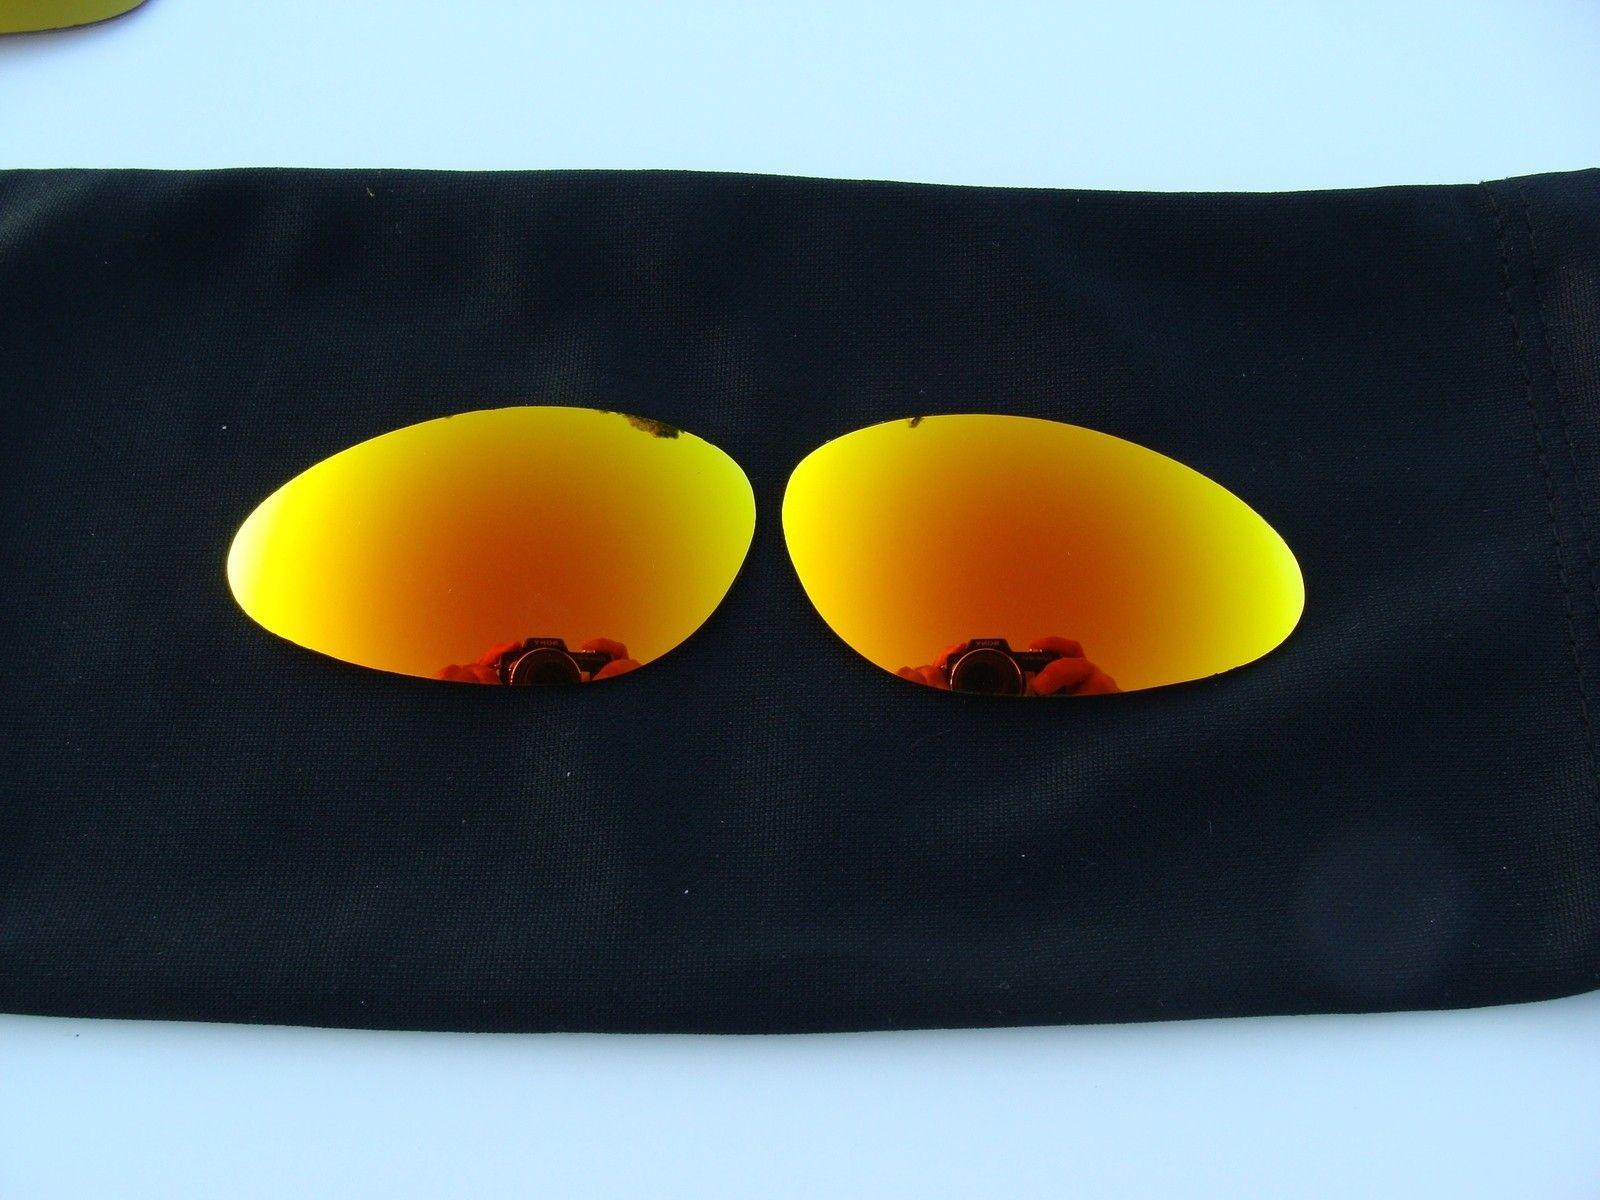 Custom Cut (Oakley) Lenses For Penny 10/011: 24k Polar, Red/Purple, Jade, Blue, Fire - DSC04610.JPG